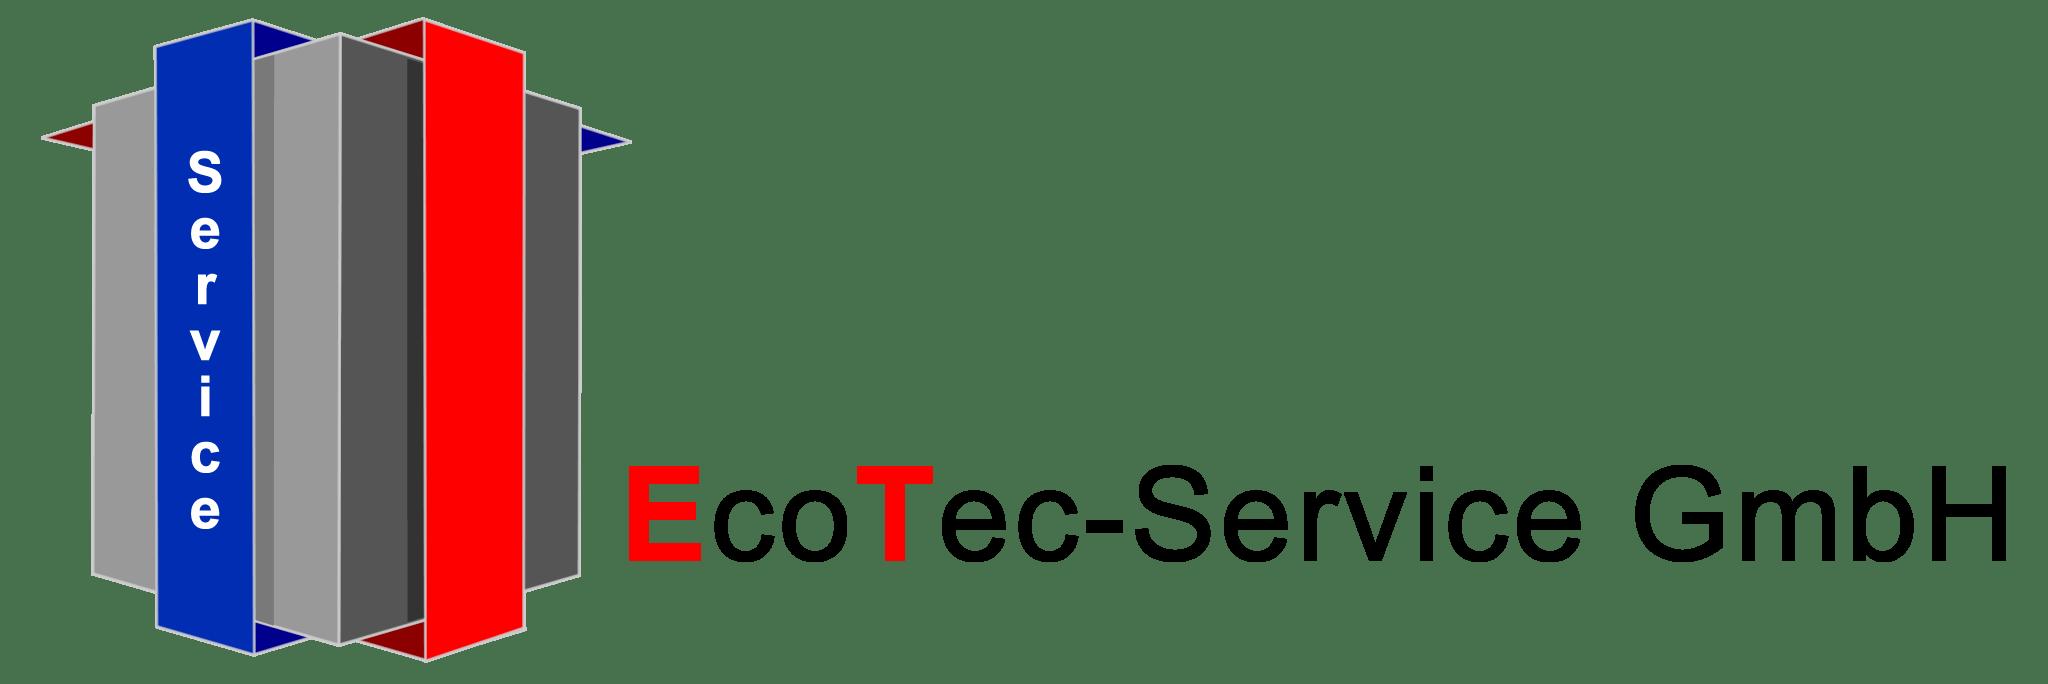 EcoTec Service GmbH